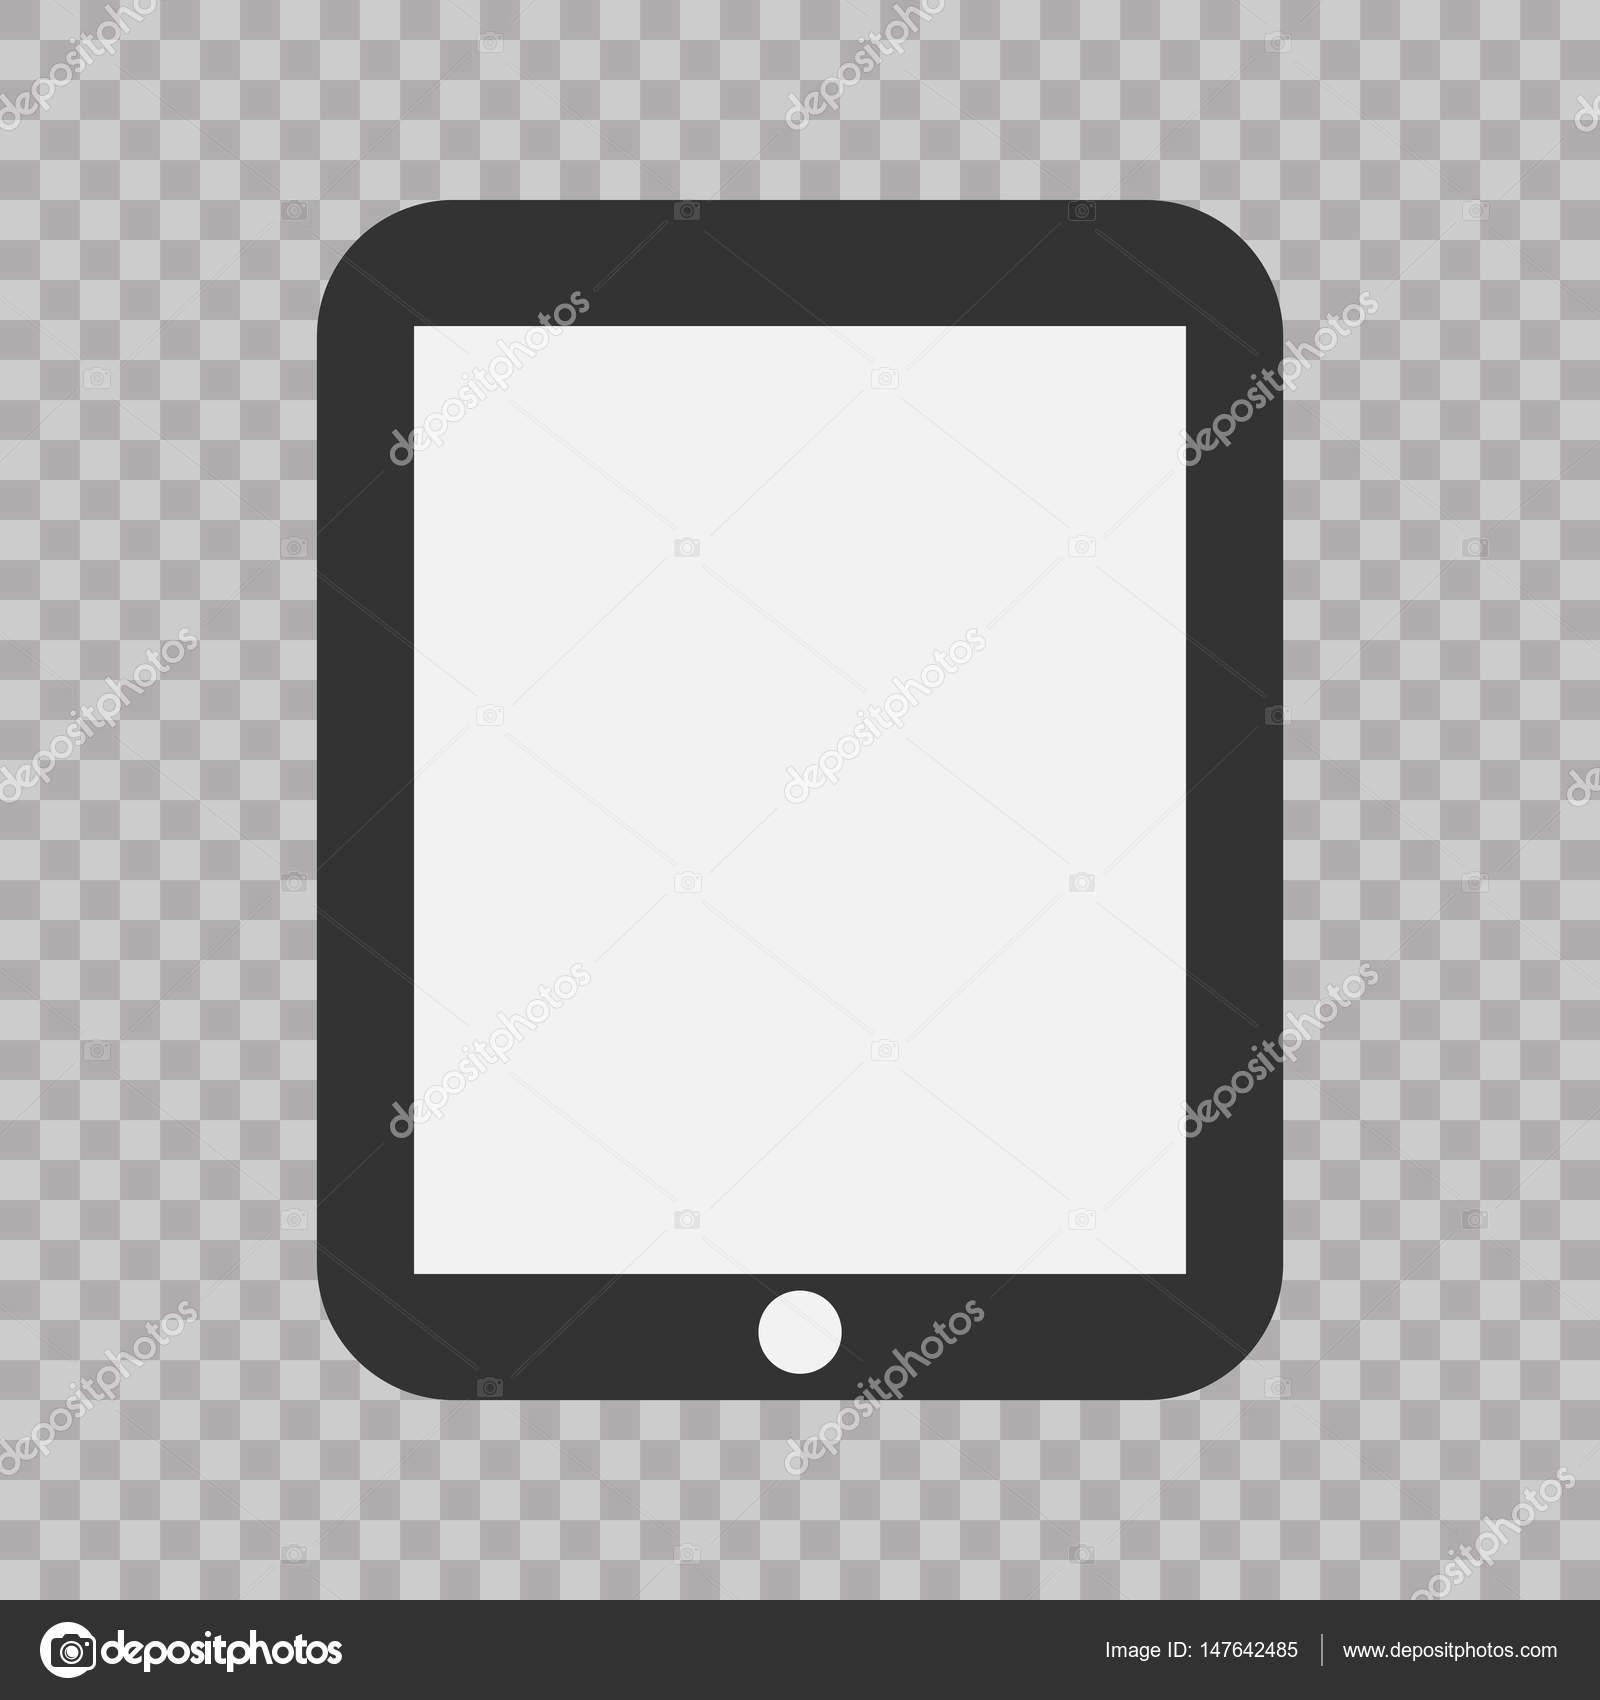 Tablet Flat Icon In Ipad Stylector Illustration Eps10 Modern